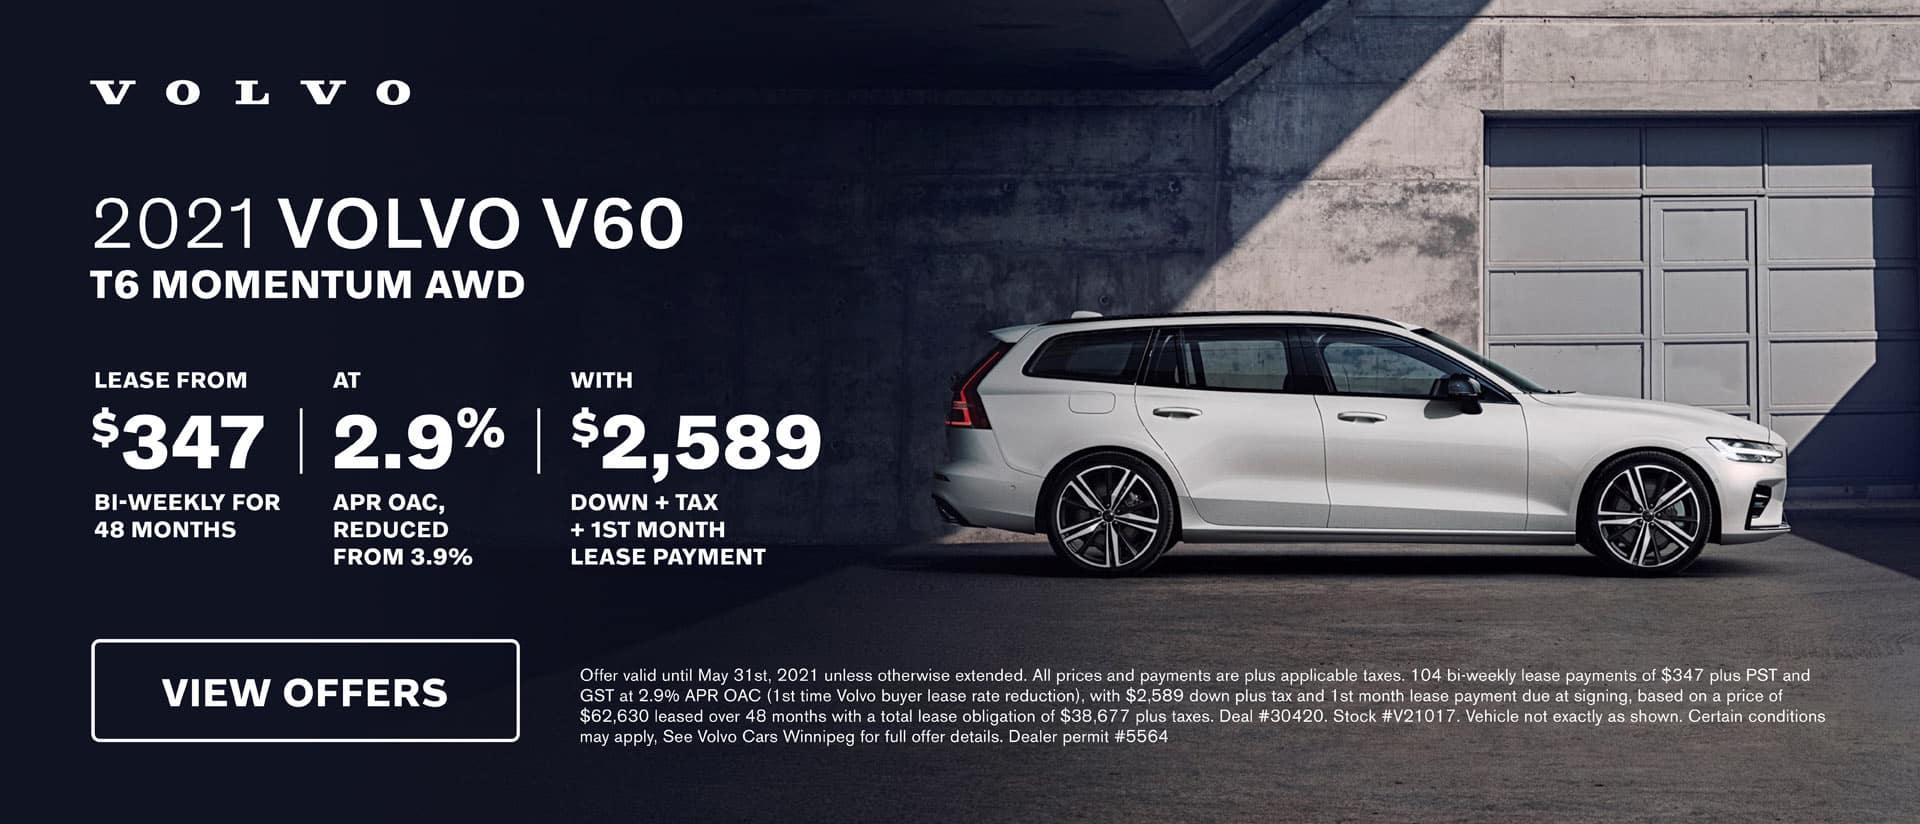 Volvo Cars Winnipeg May V60 Offer